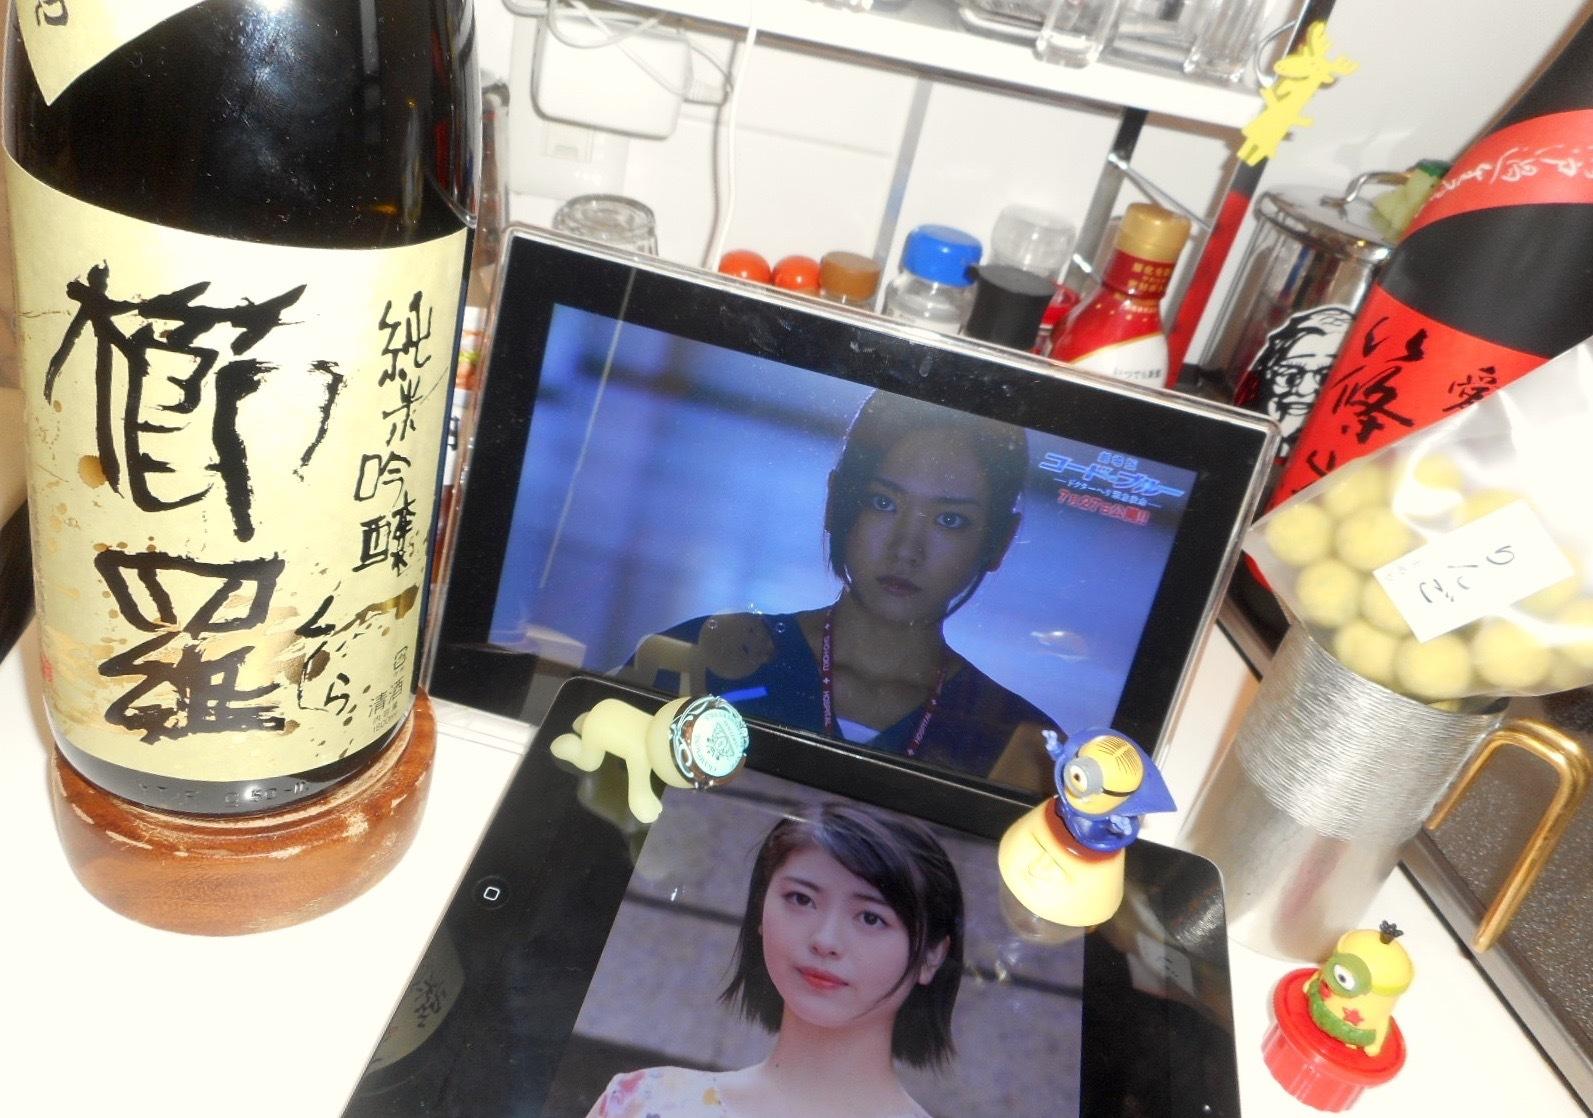 kujira_jungin29by2_1a.jpg